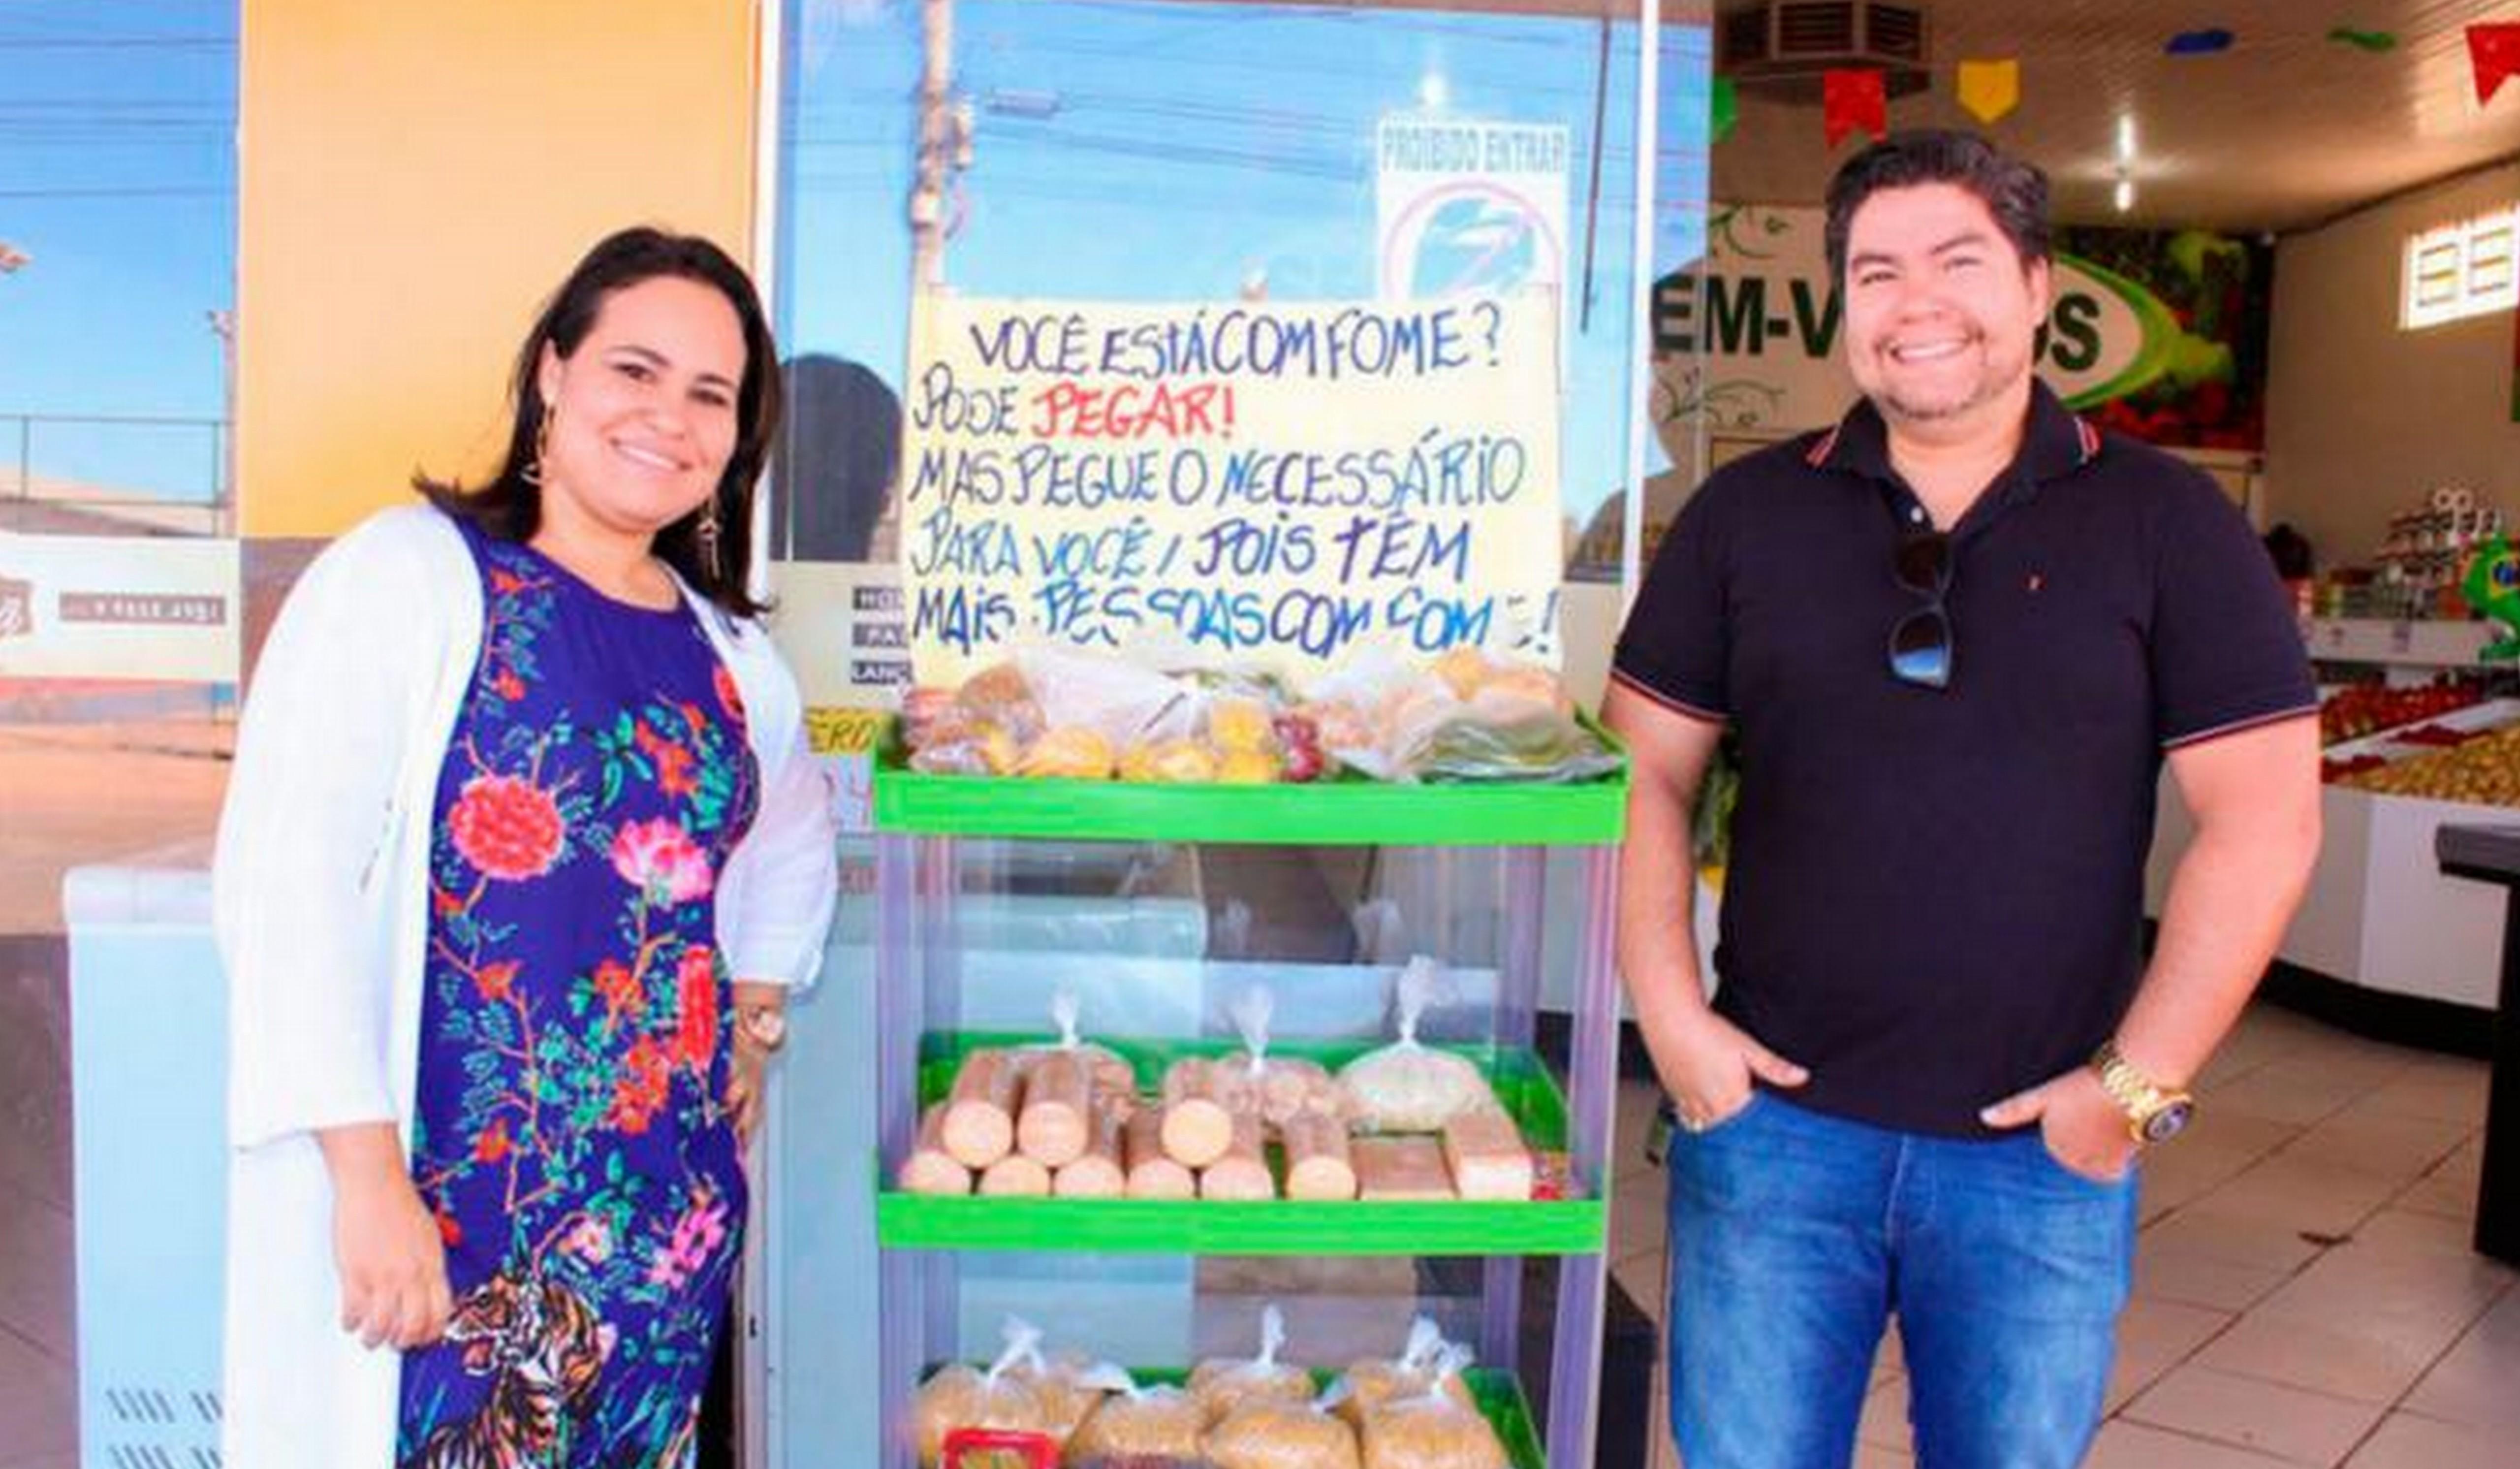 Dono de mercados, casal doa alimentos a pessoas carentes 3